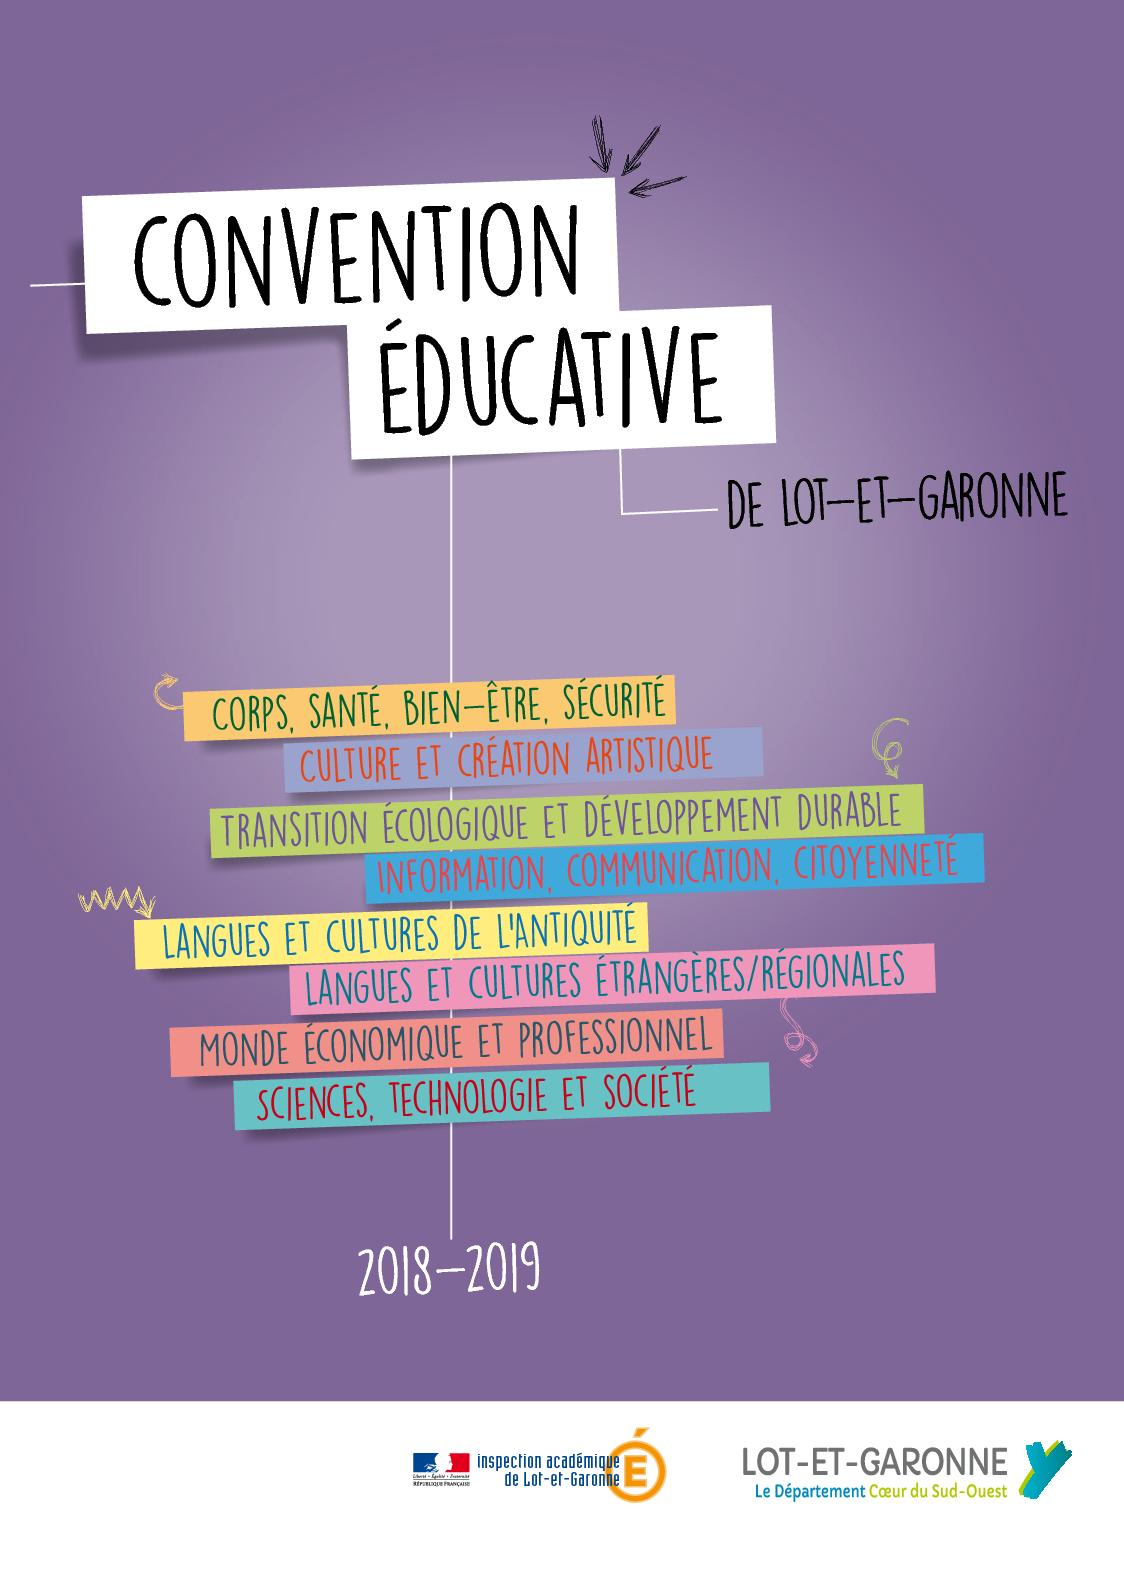 Convention Educative 2018-2019